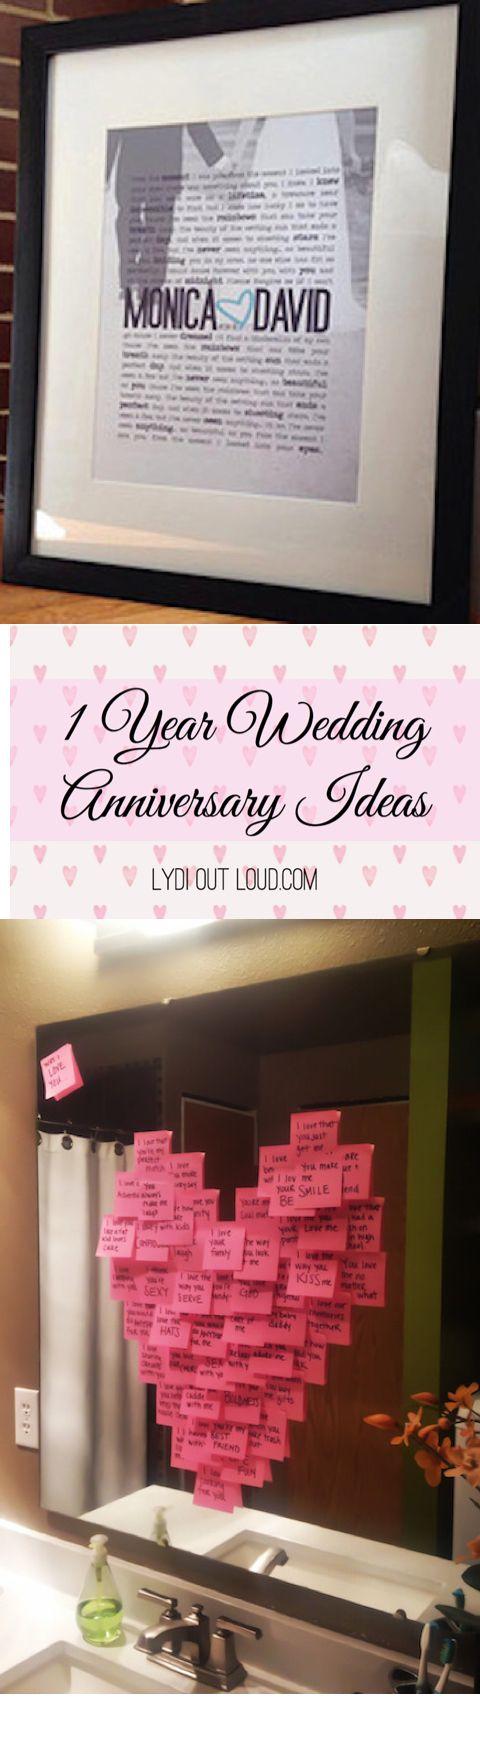 1 Year Wedding Anniversary ideas - paper gift!